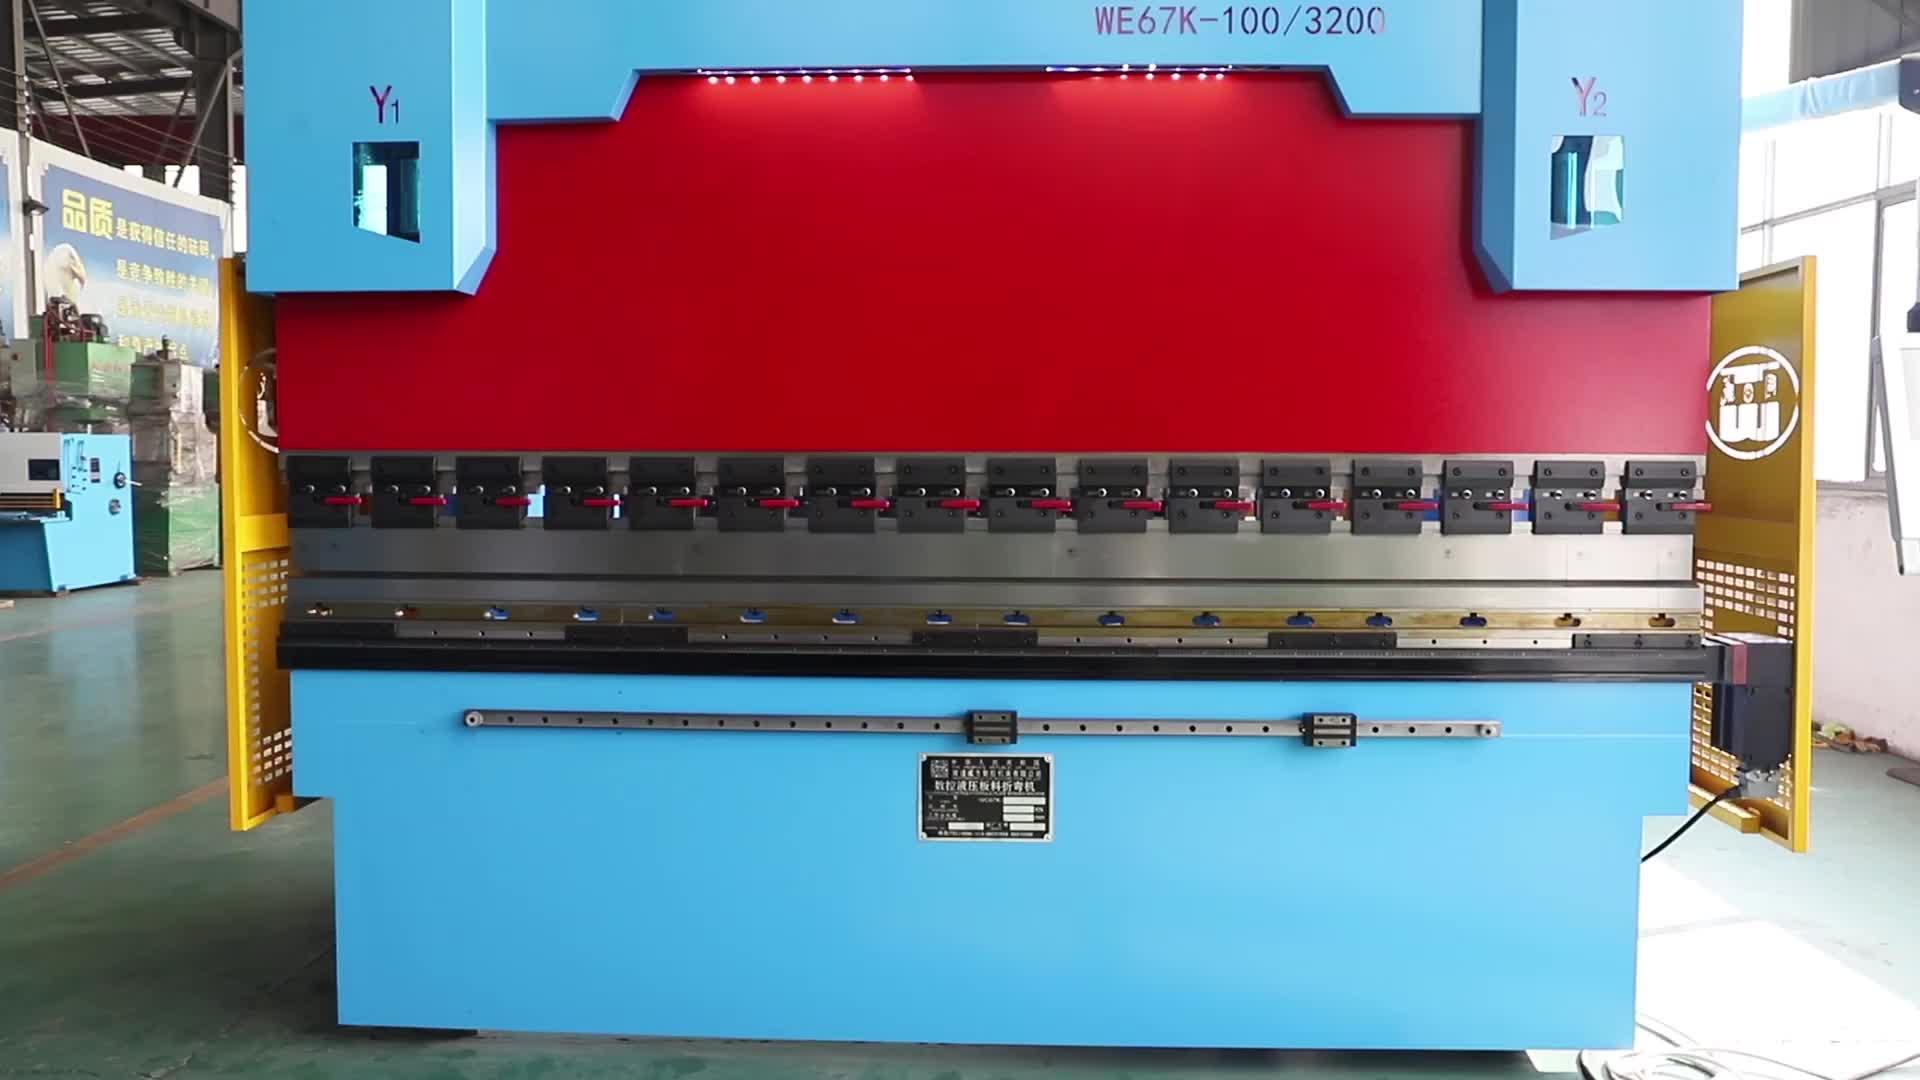 सीएनसी/नेकां हाइड्रोलिक प्रेस ब्रेक मशीन तह झुकने मशीन, प्लेट झुकने मशीन, शीट धातु झुकने मशीन